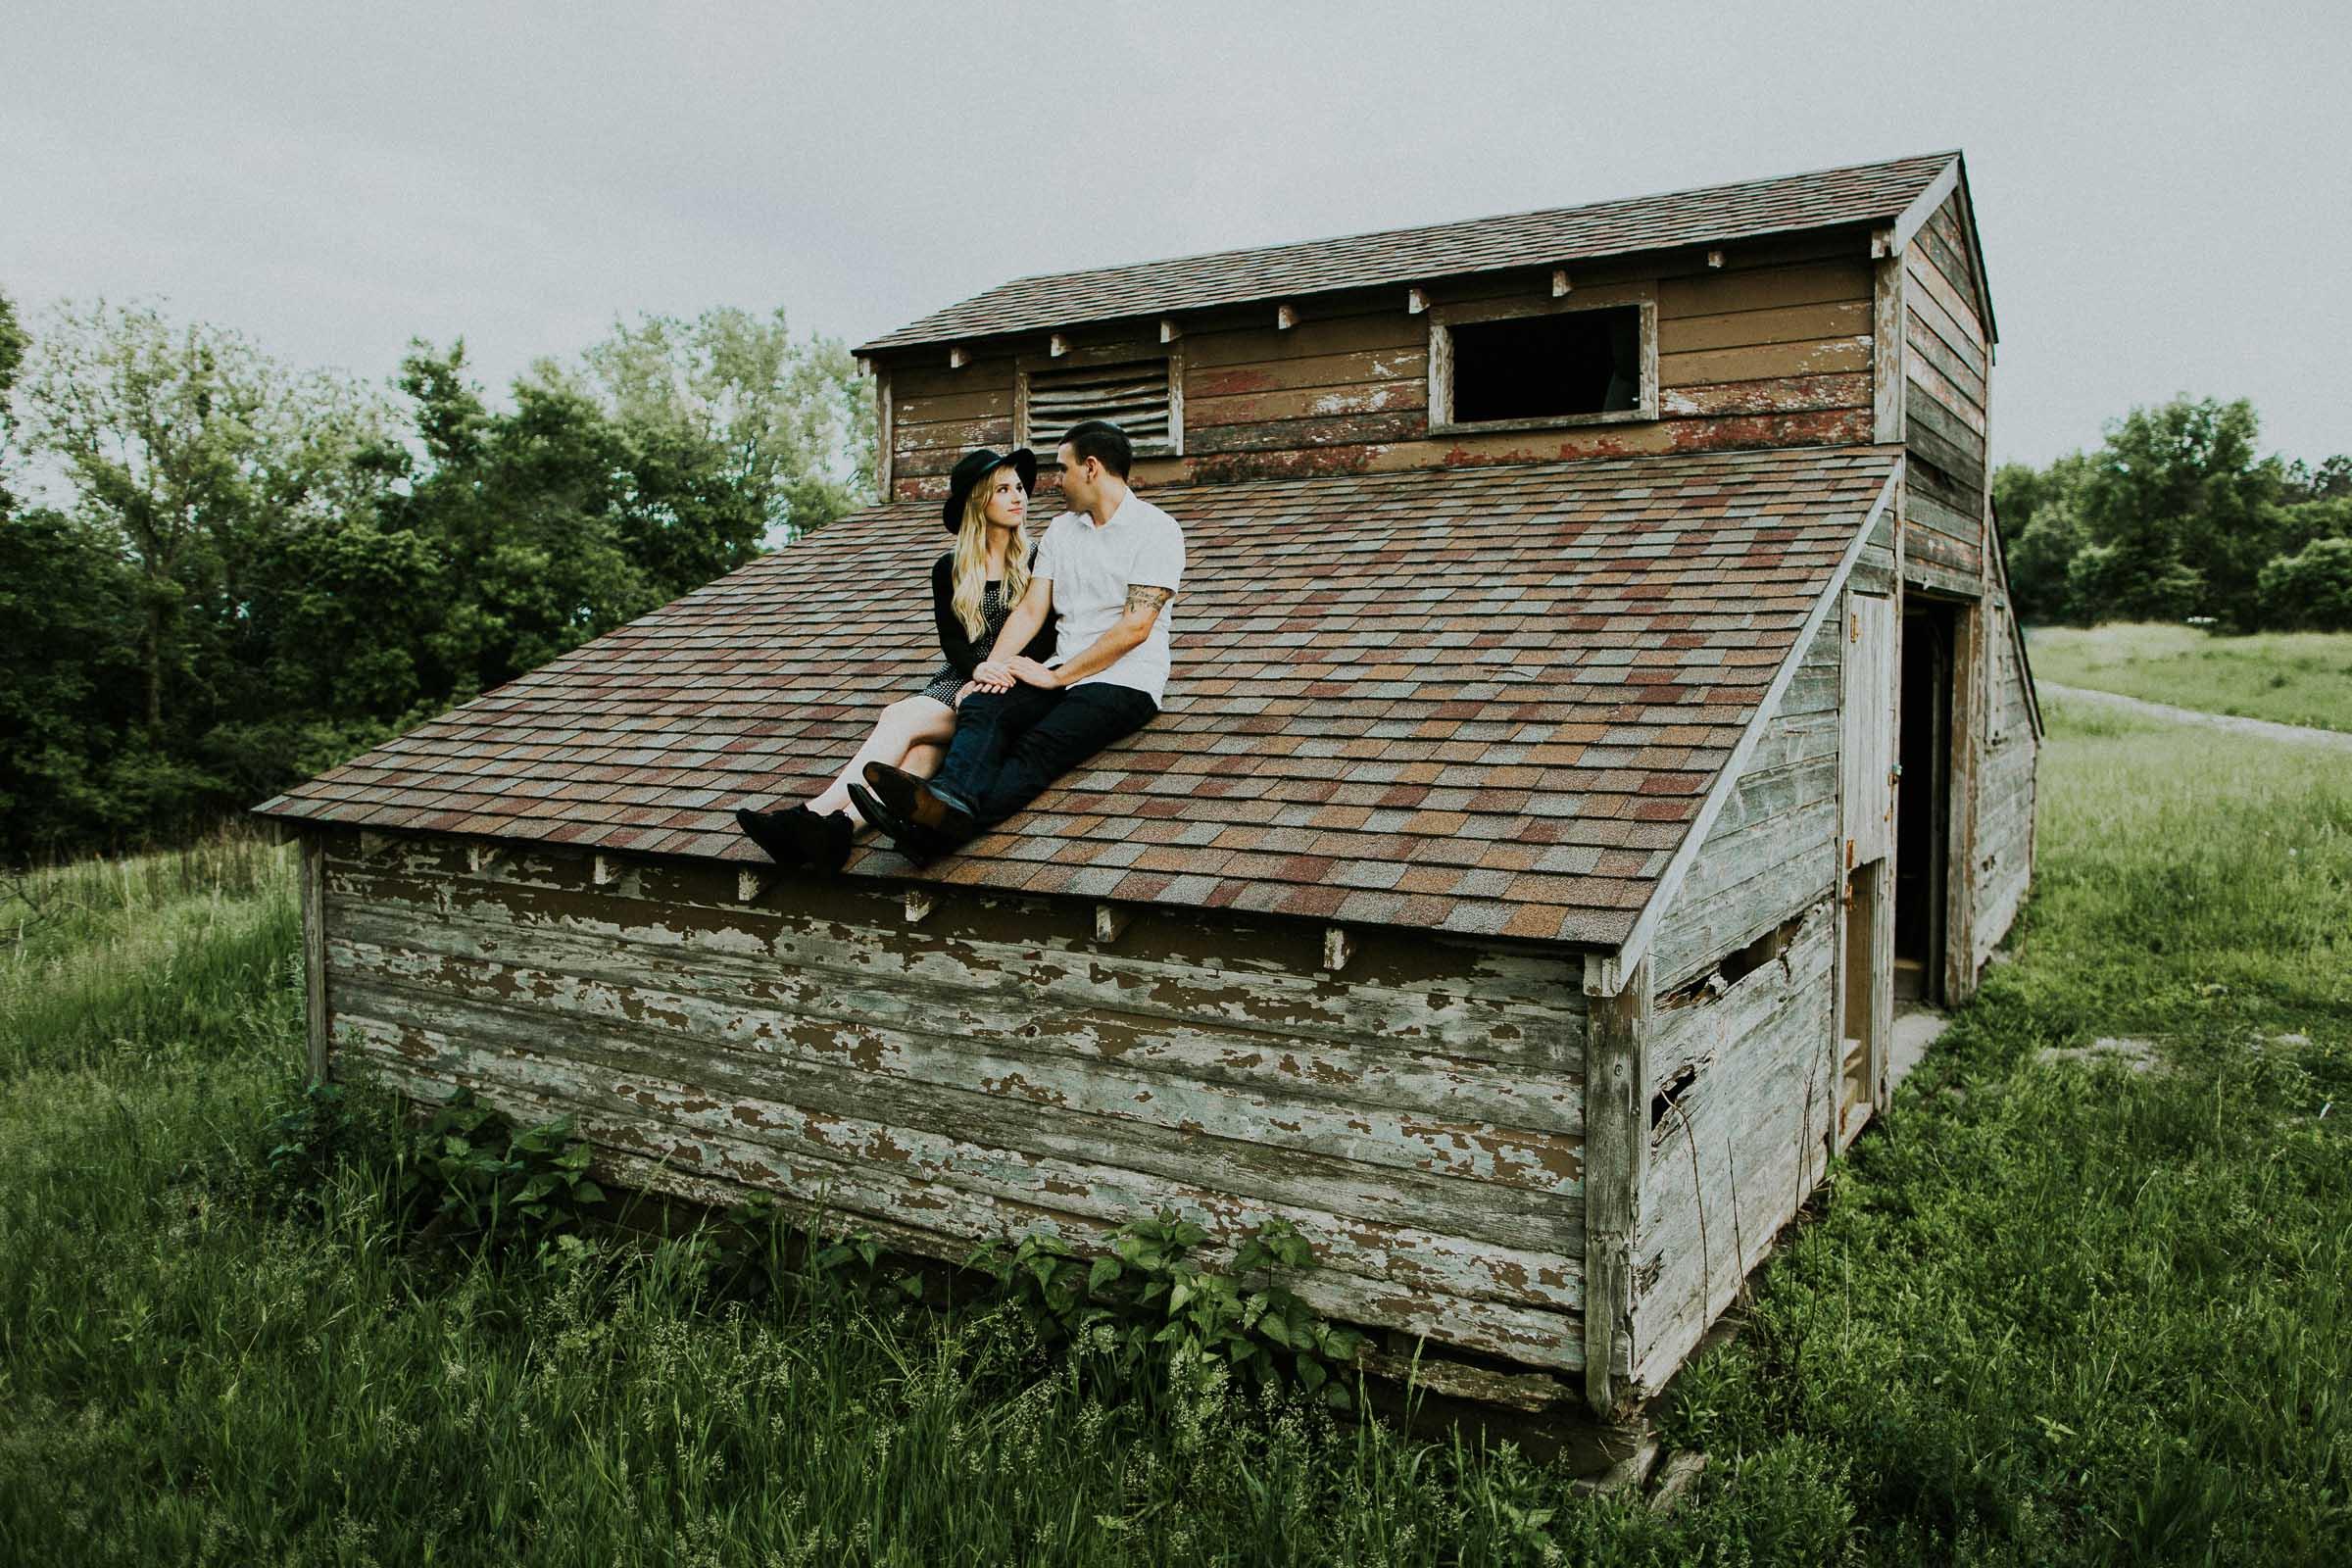 Aaron + Johanna  Neal Woods Barn Engagement Session in Nebraska   VIEW